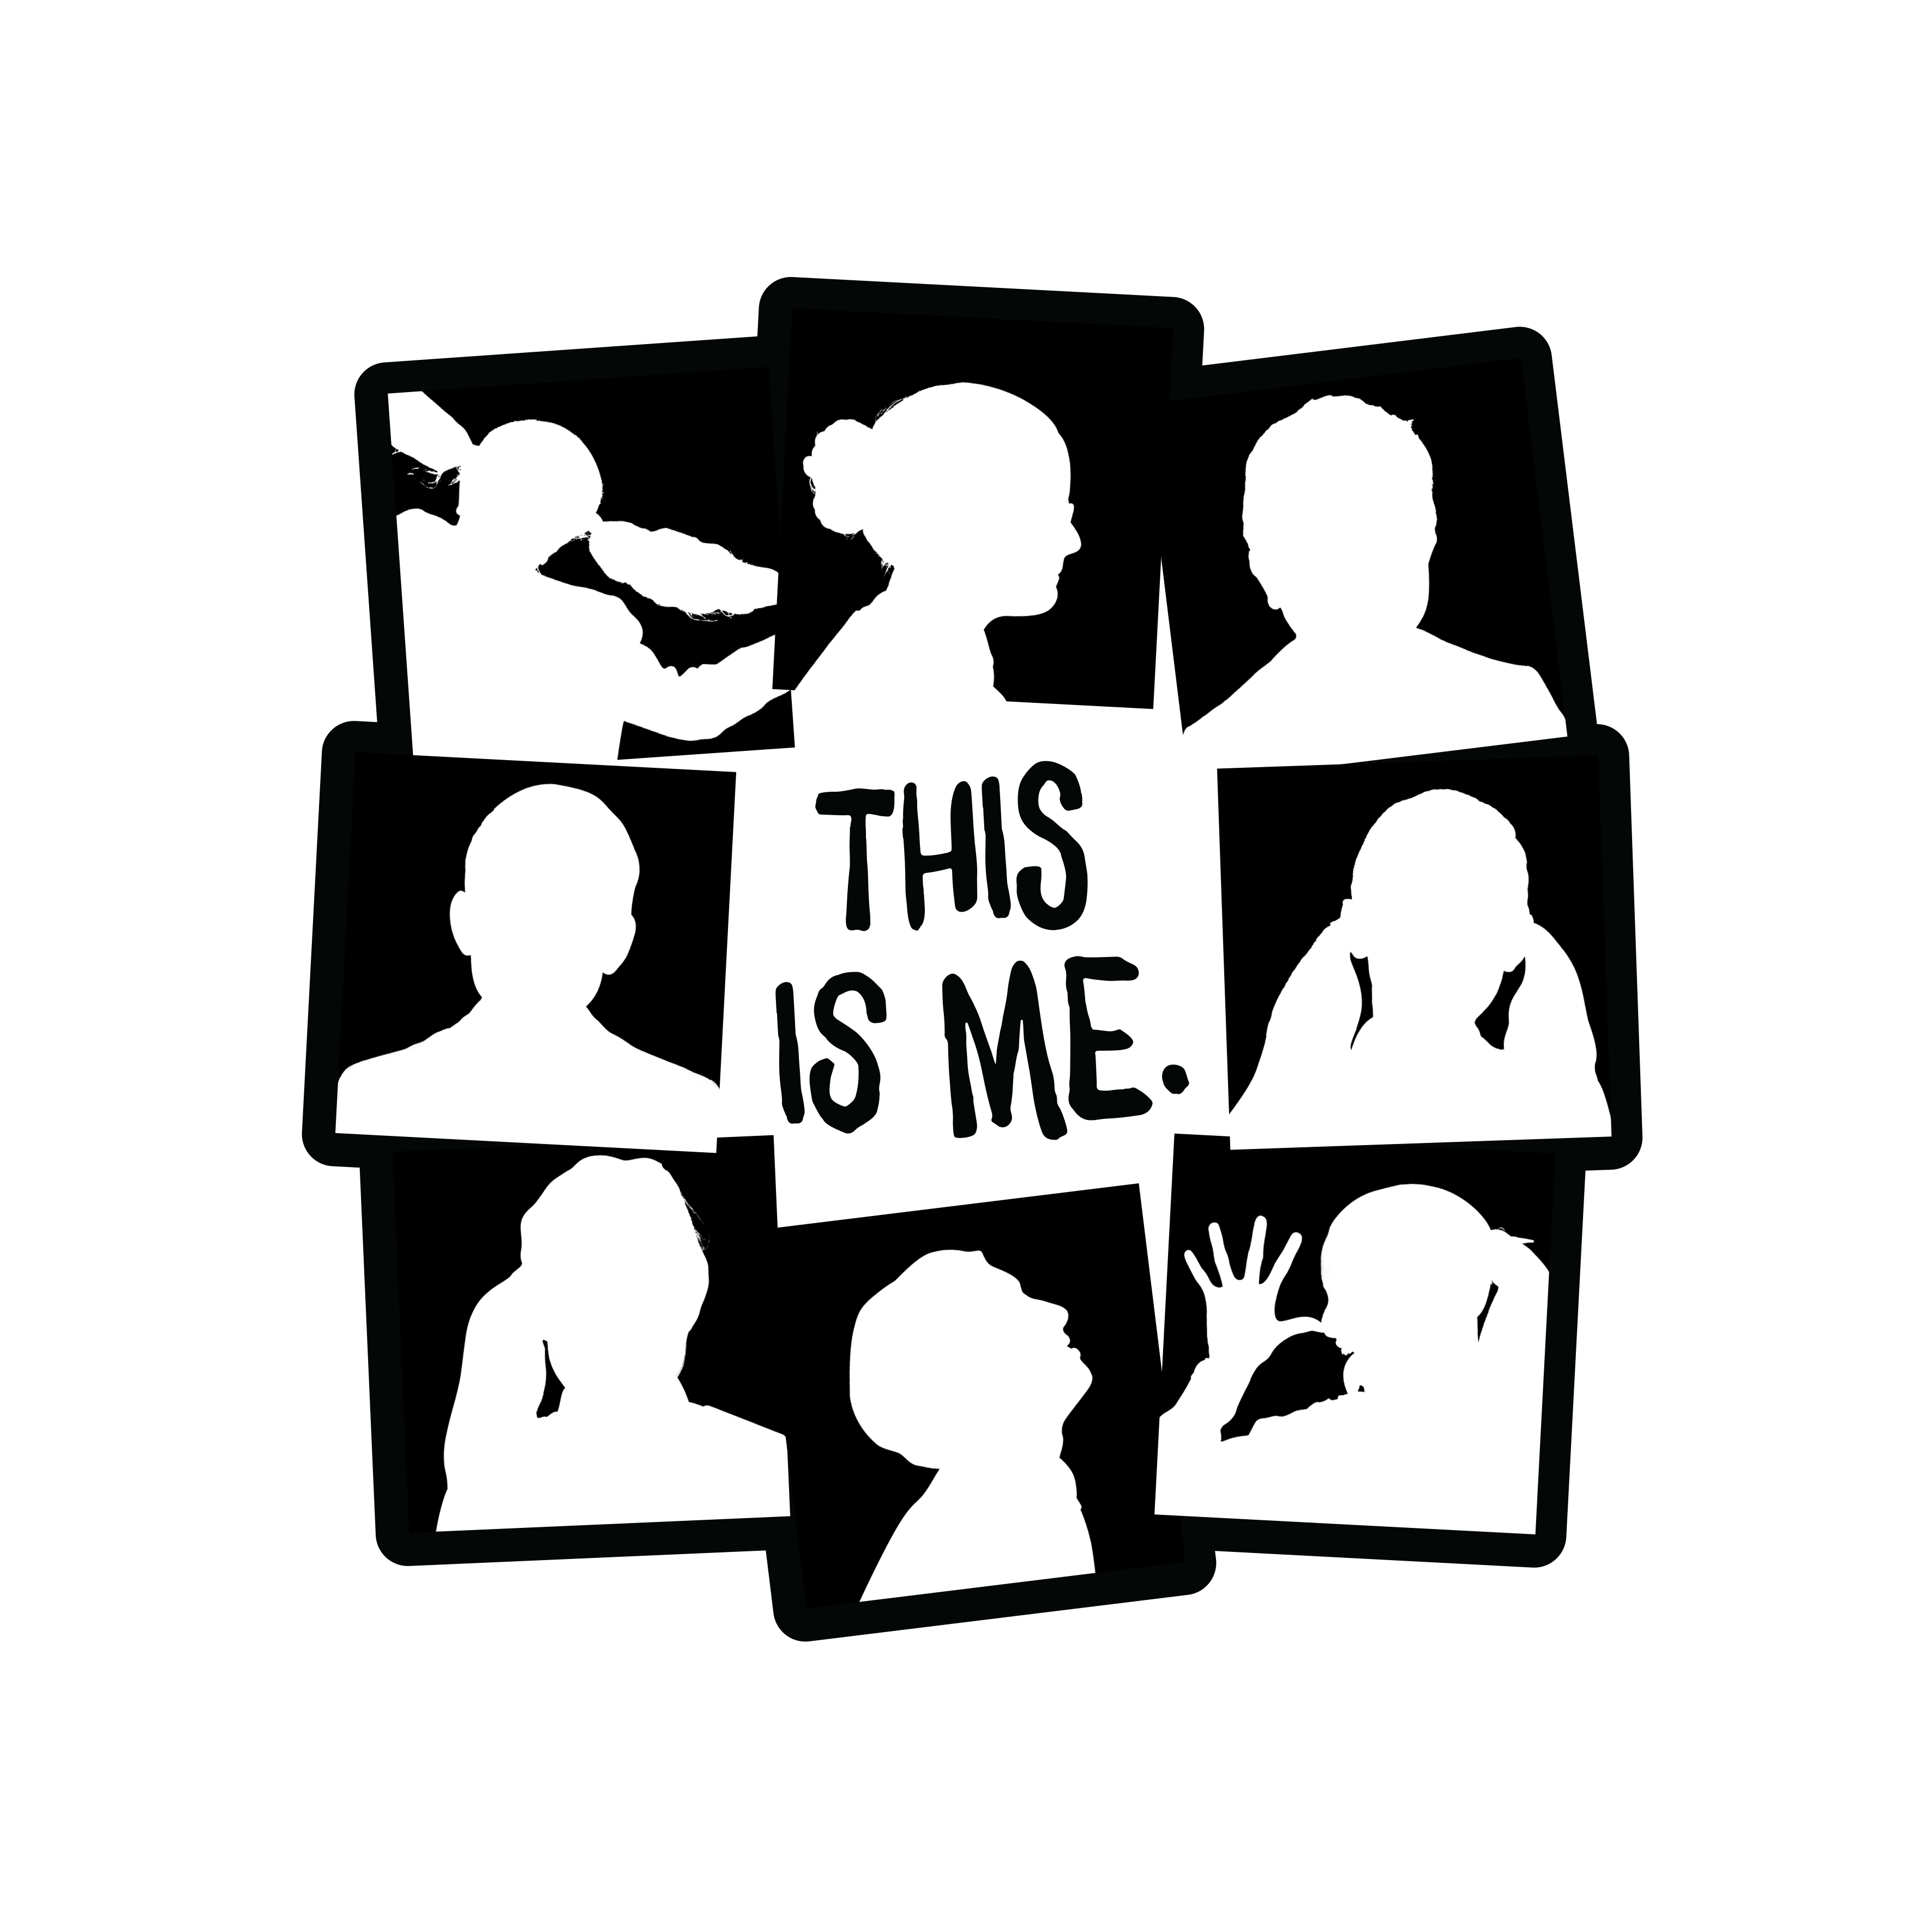 CLA024-ST-This-Is-Me-branding-ALL-BLACK-1.jpg?mtime=20180820150408#asset:7958